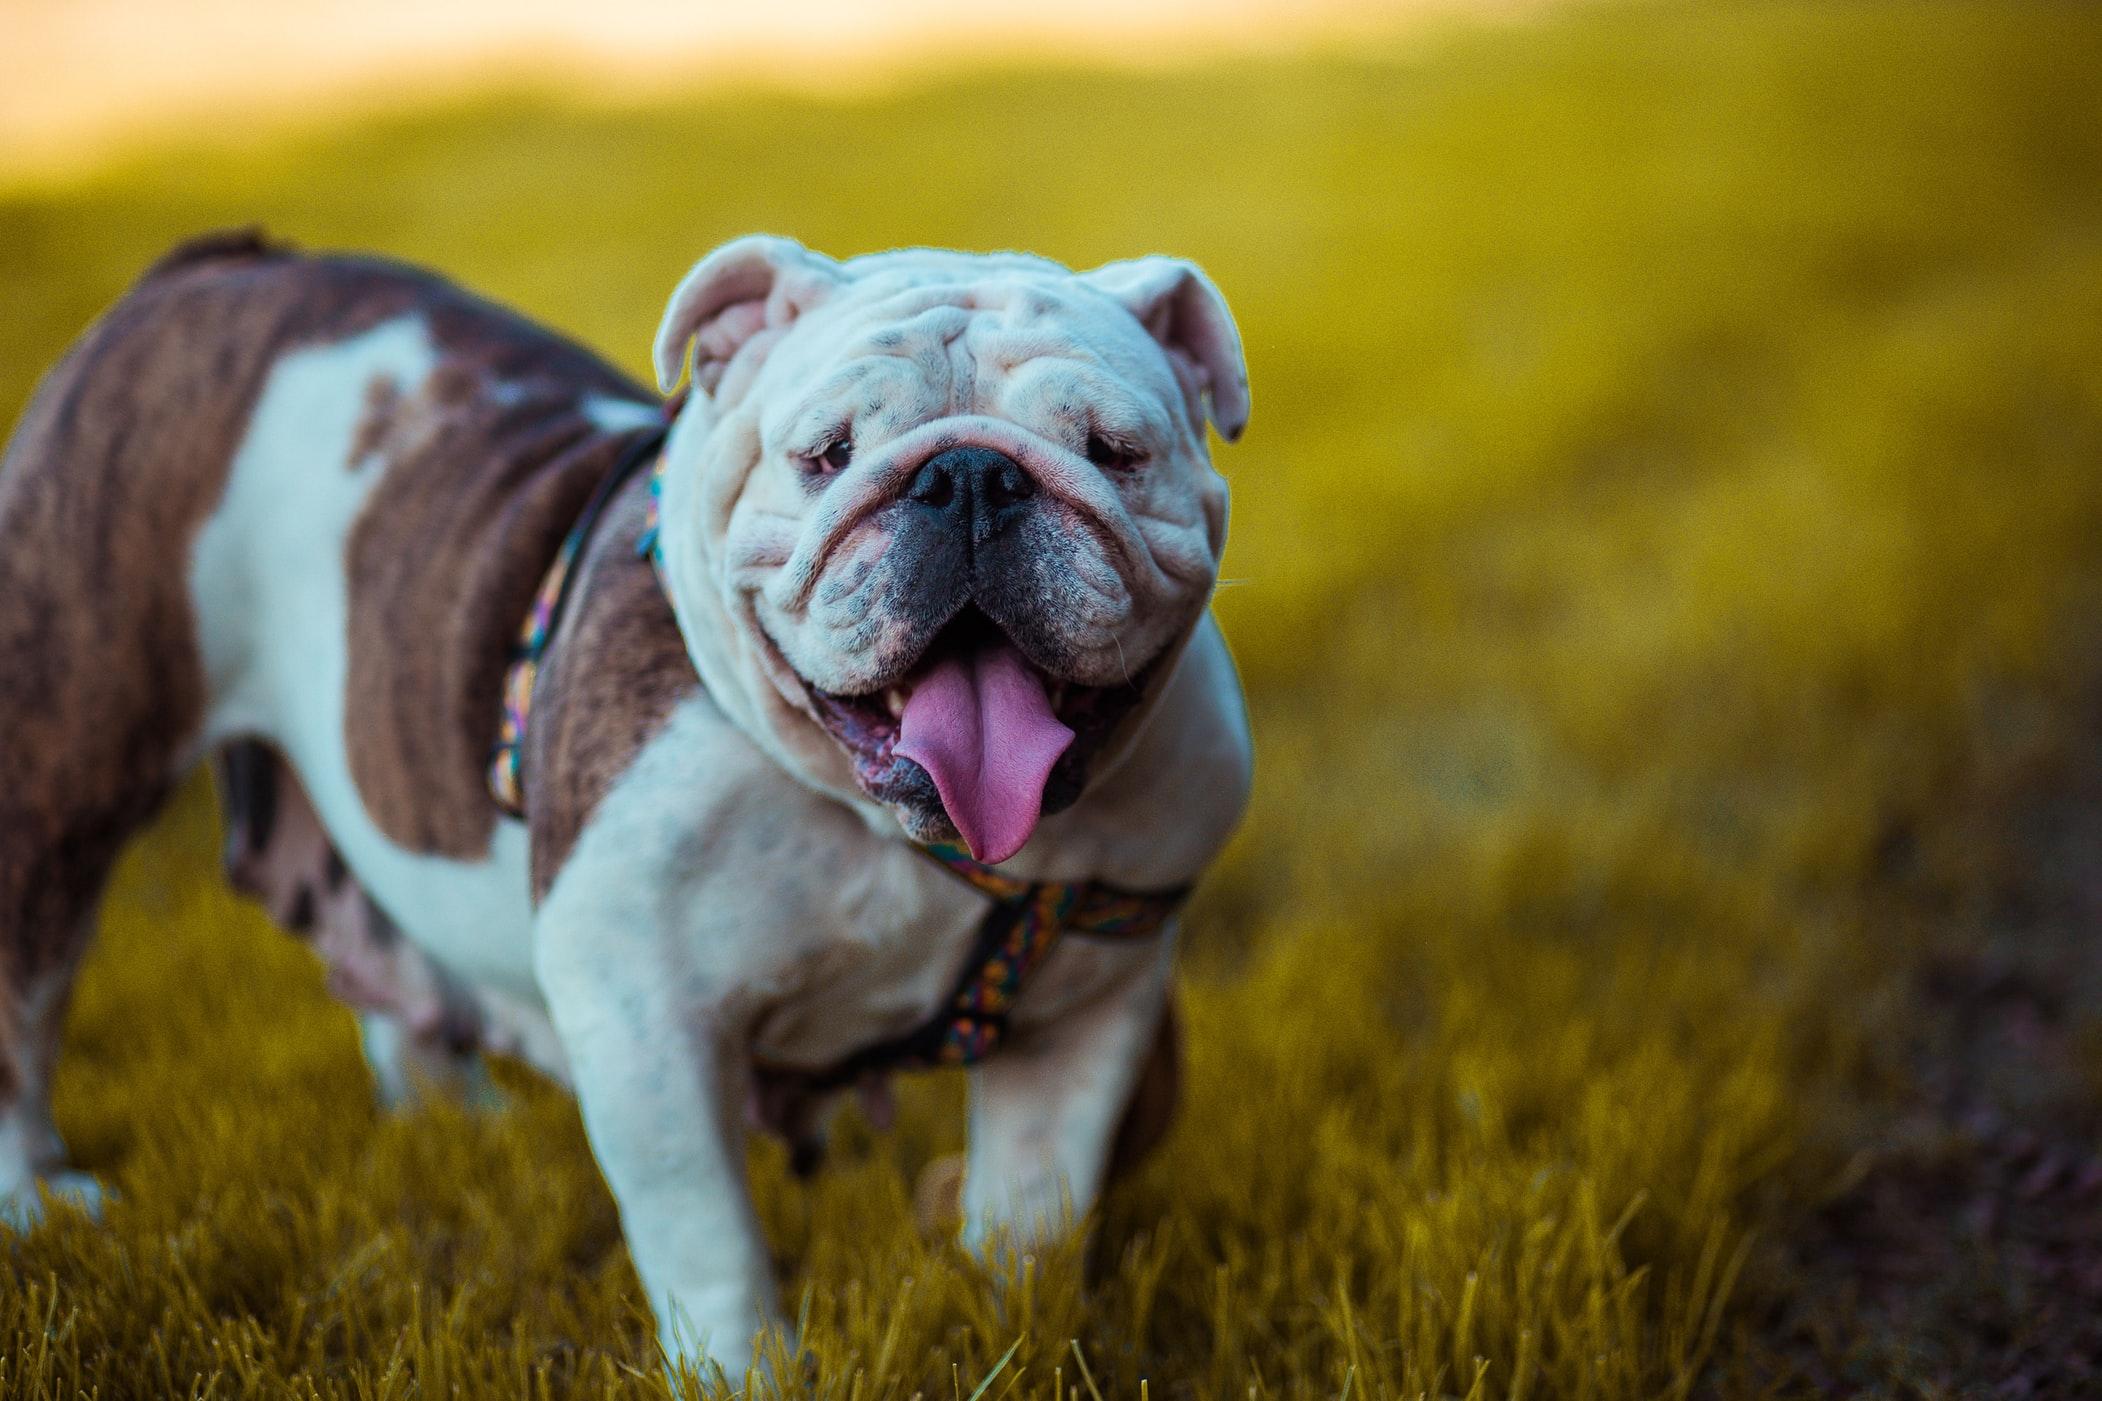 NatrixOne Chomper Happy Pup